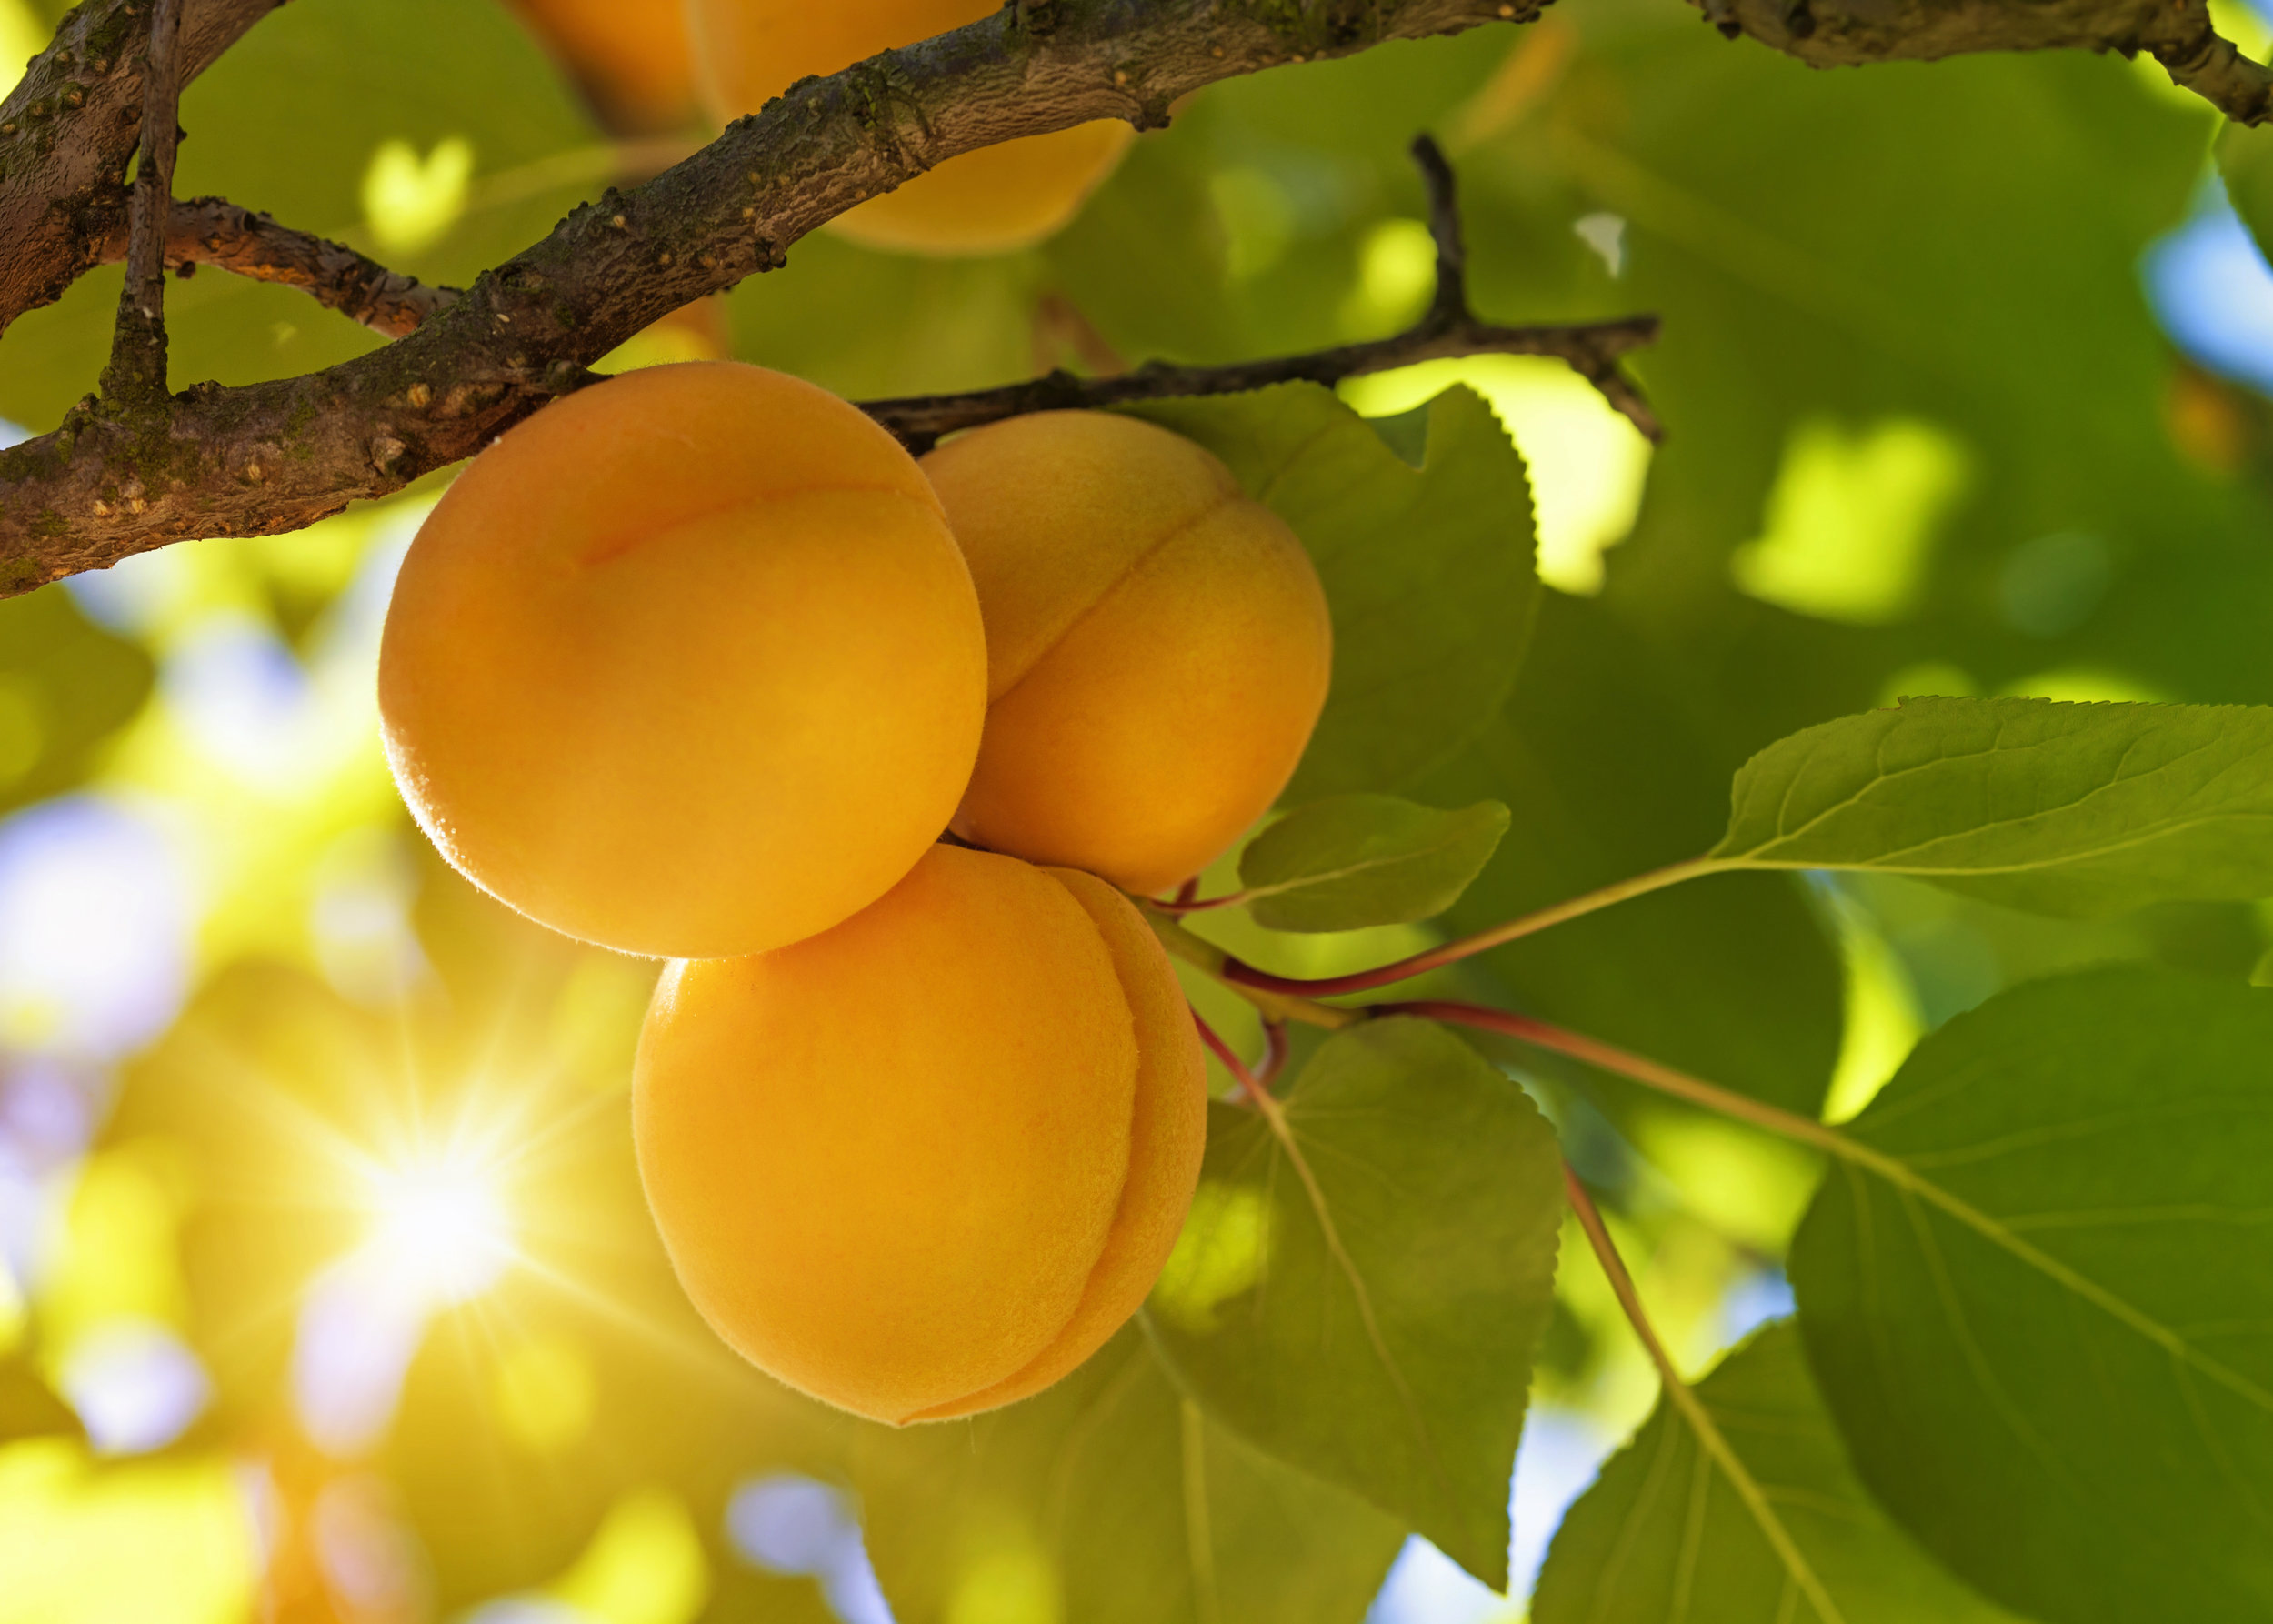 Apricot-tree-with-fruits-483094969_5242x3744.jpeg